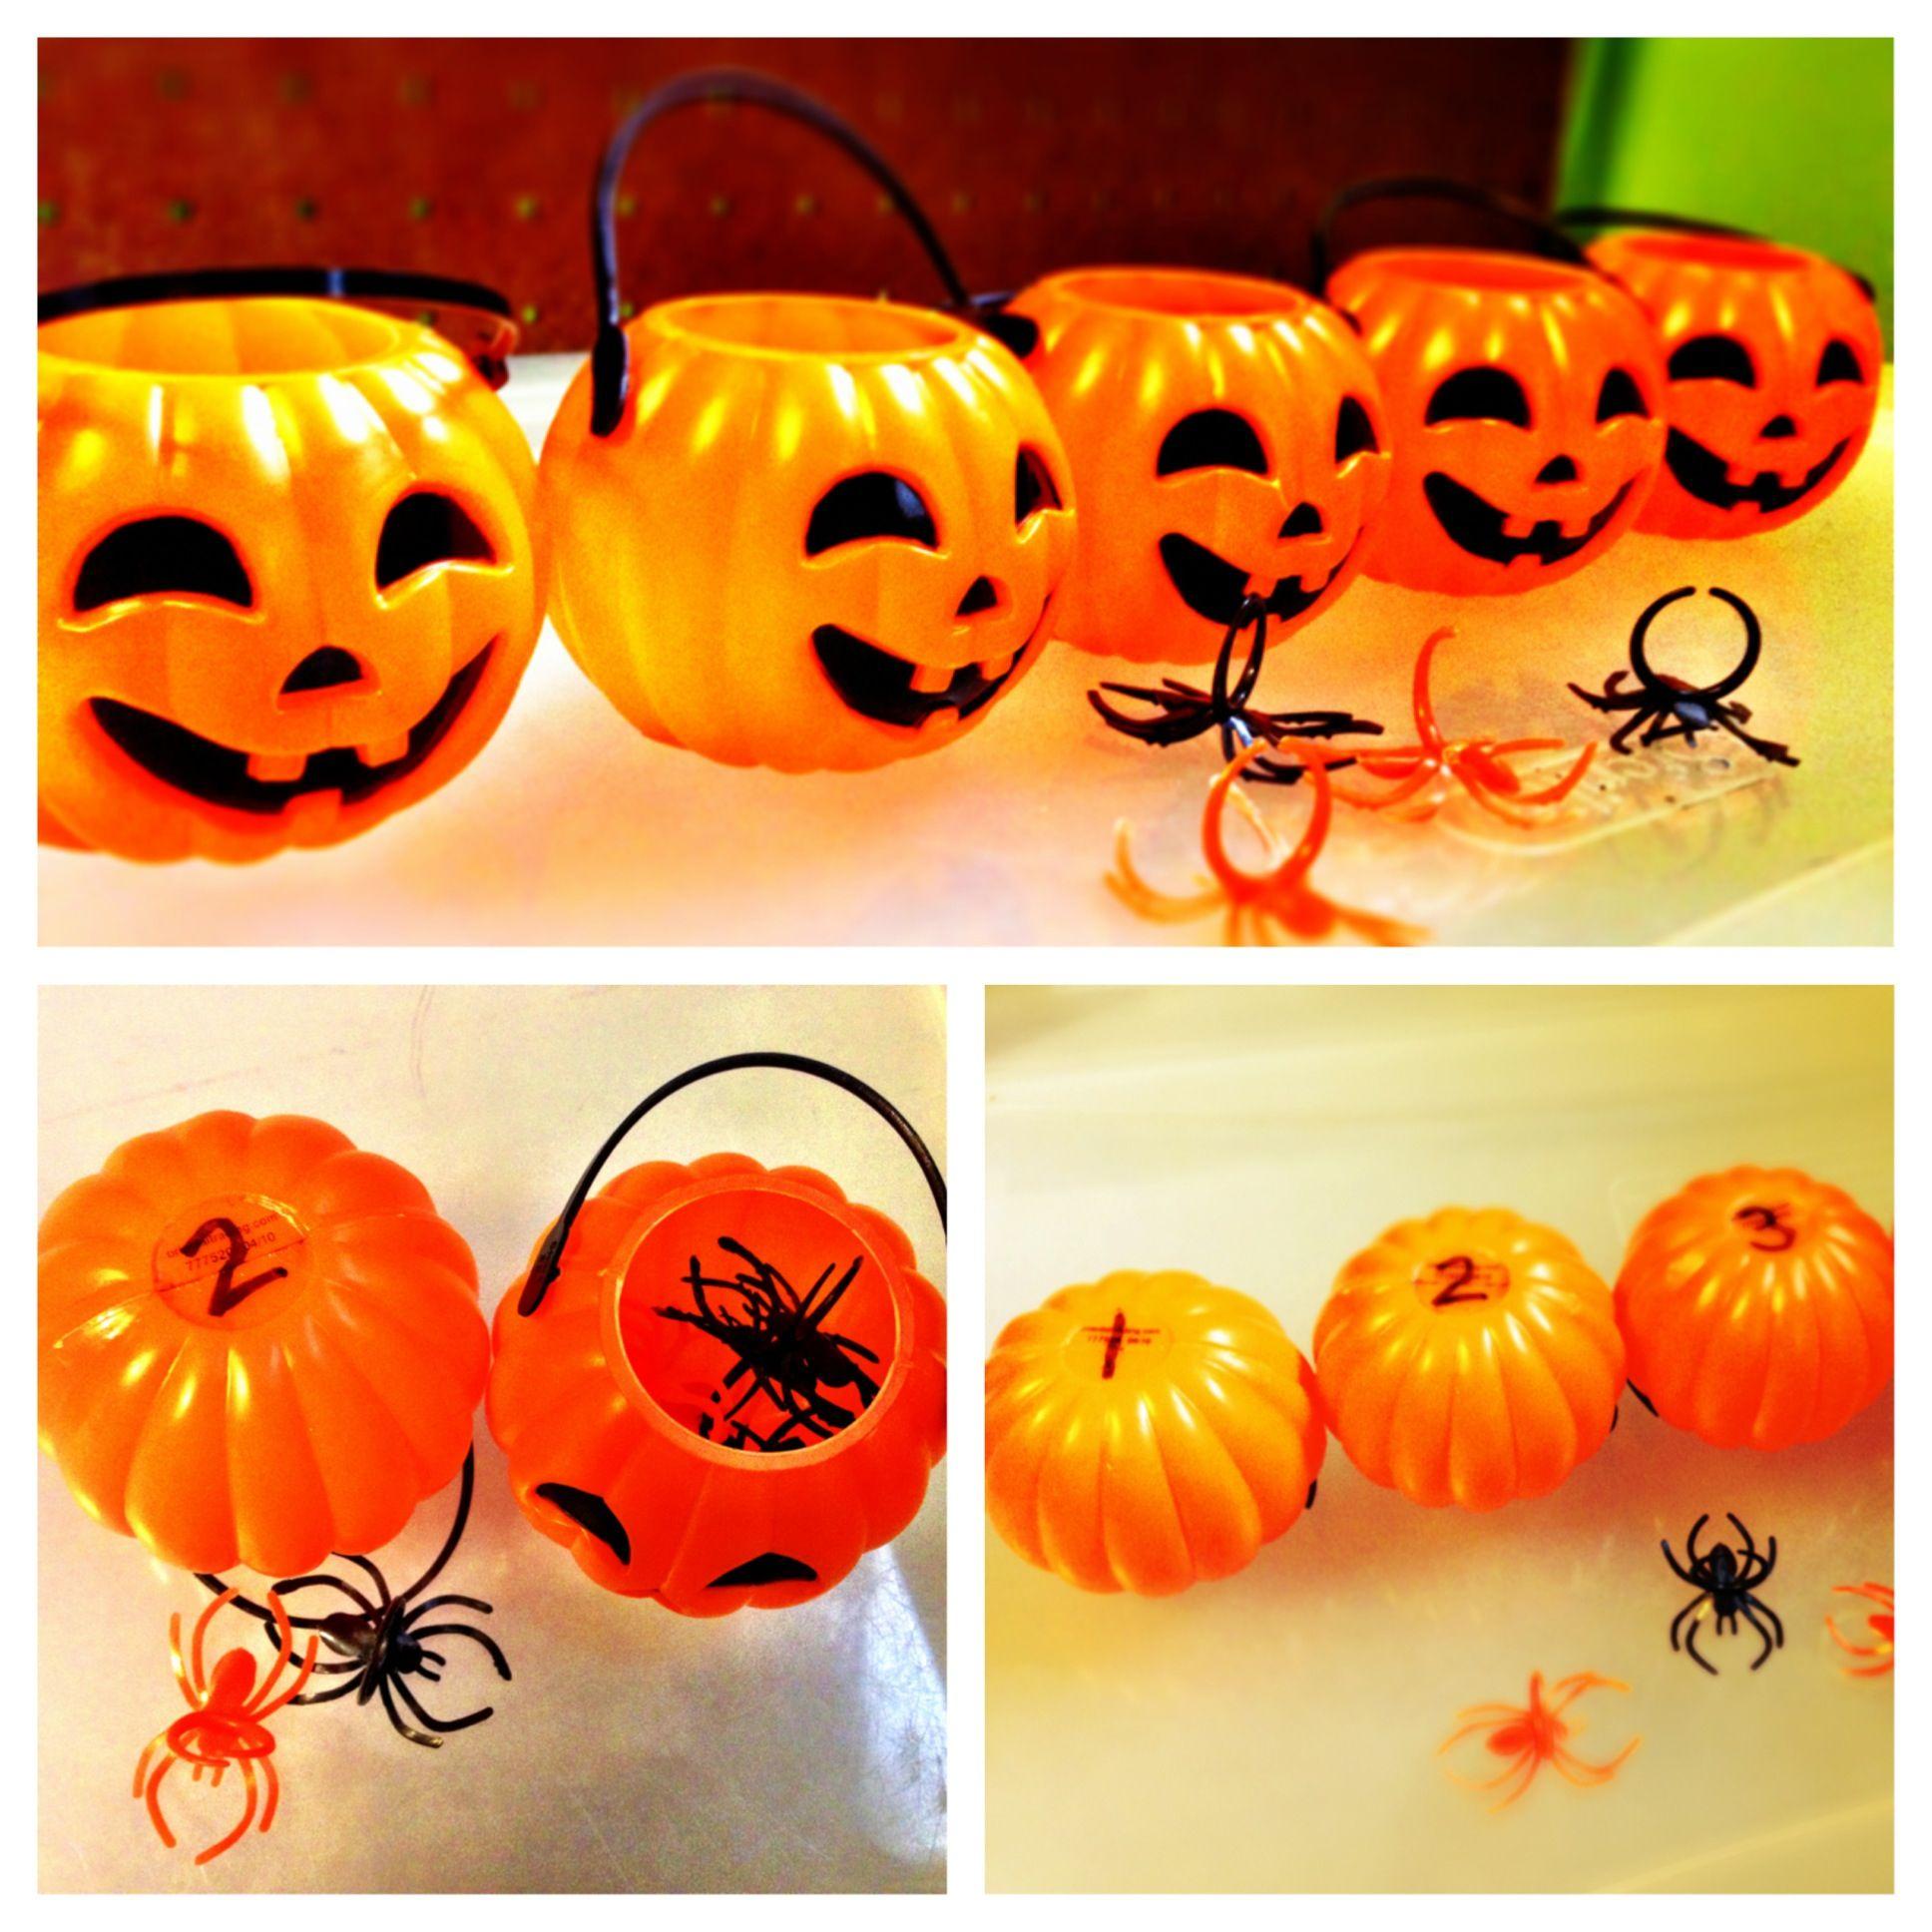 Halloween Preschool Pumpkin Activity Label 5 Mini Pumpkin Buckets 1 5 Provide Small Counters